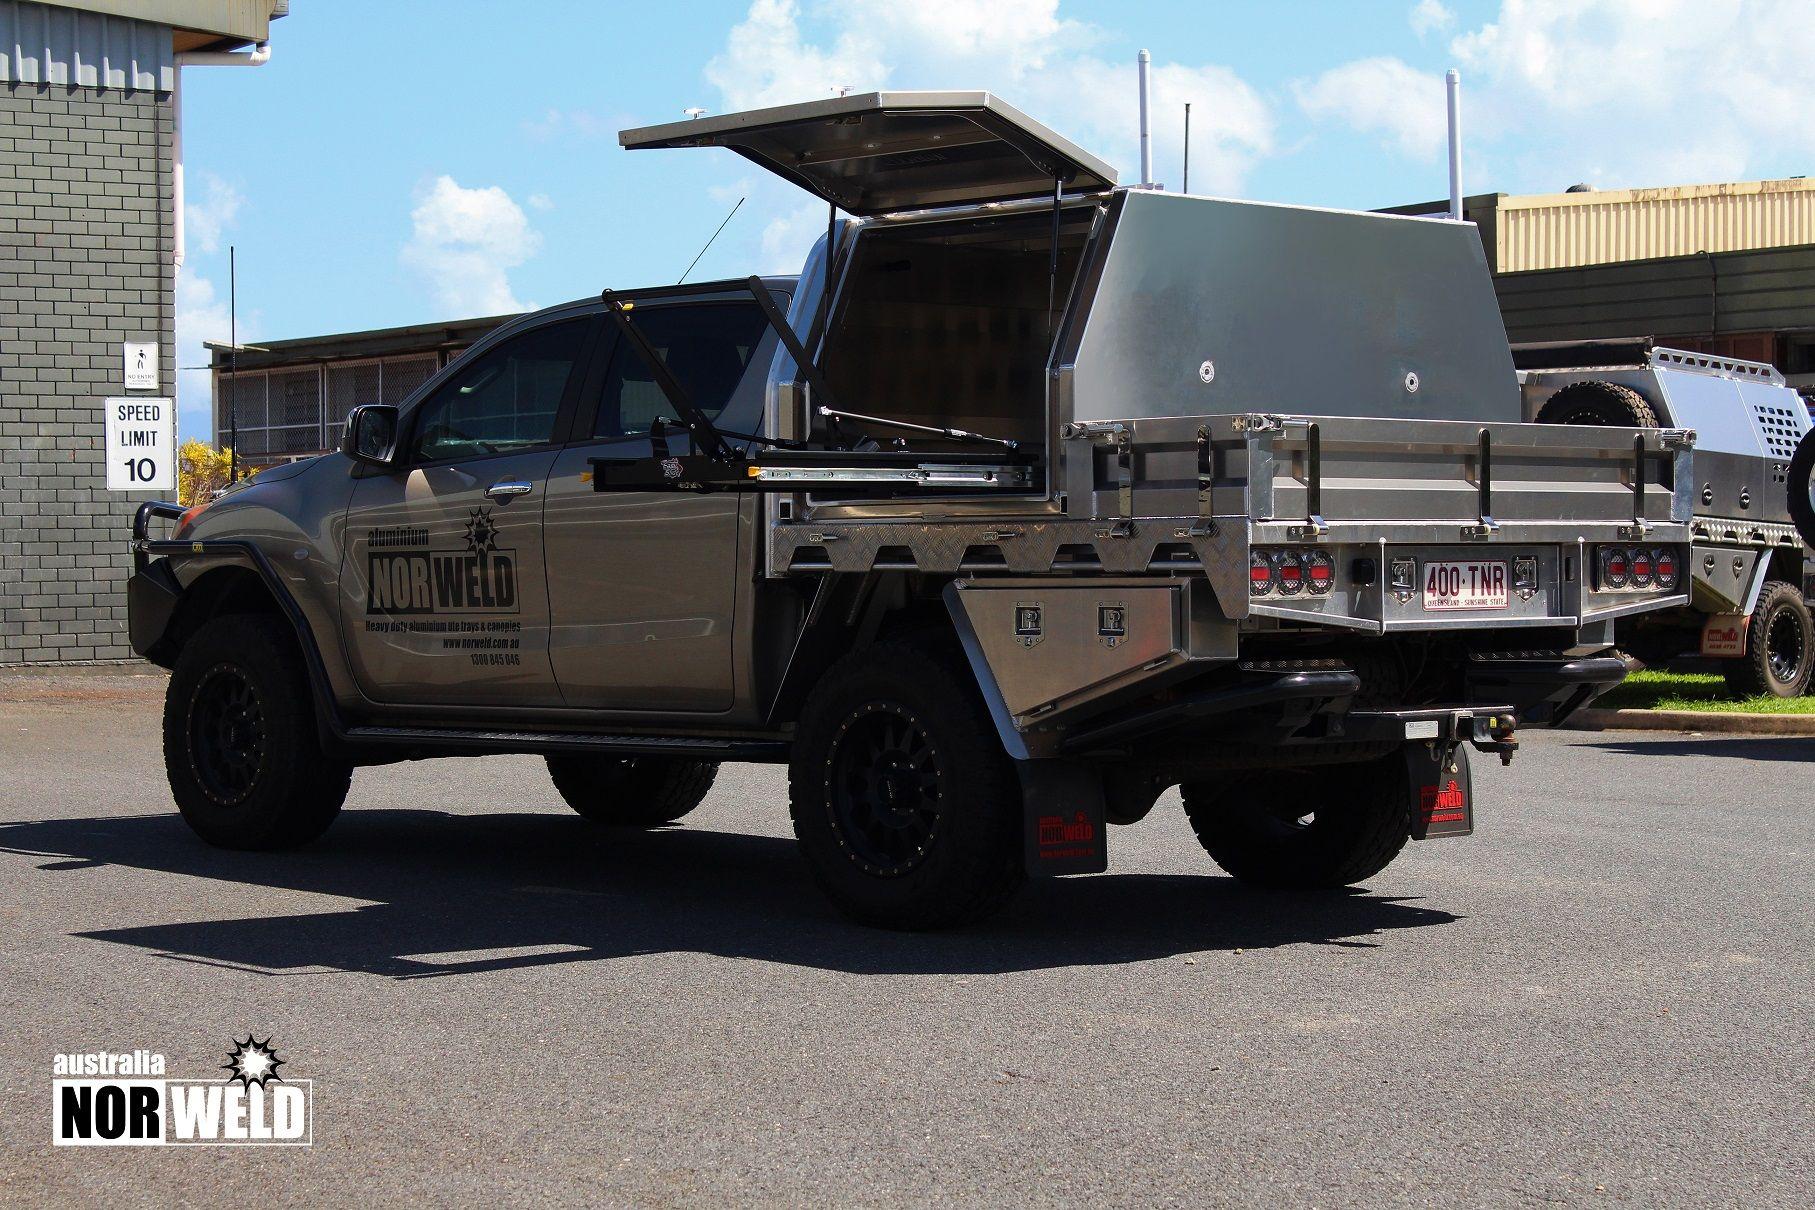 Half Canopy Pack 3 1150mm 1 Norweld Aluminium Ute Trays And